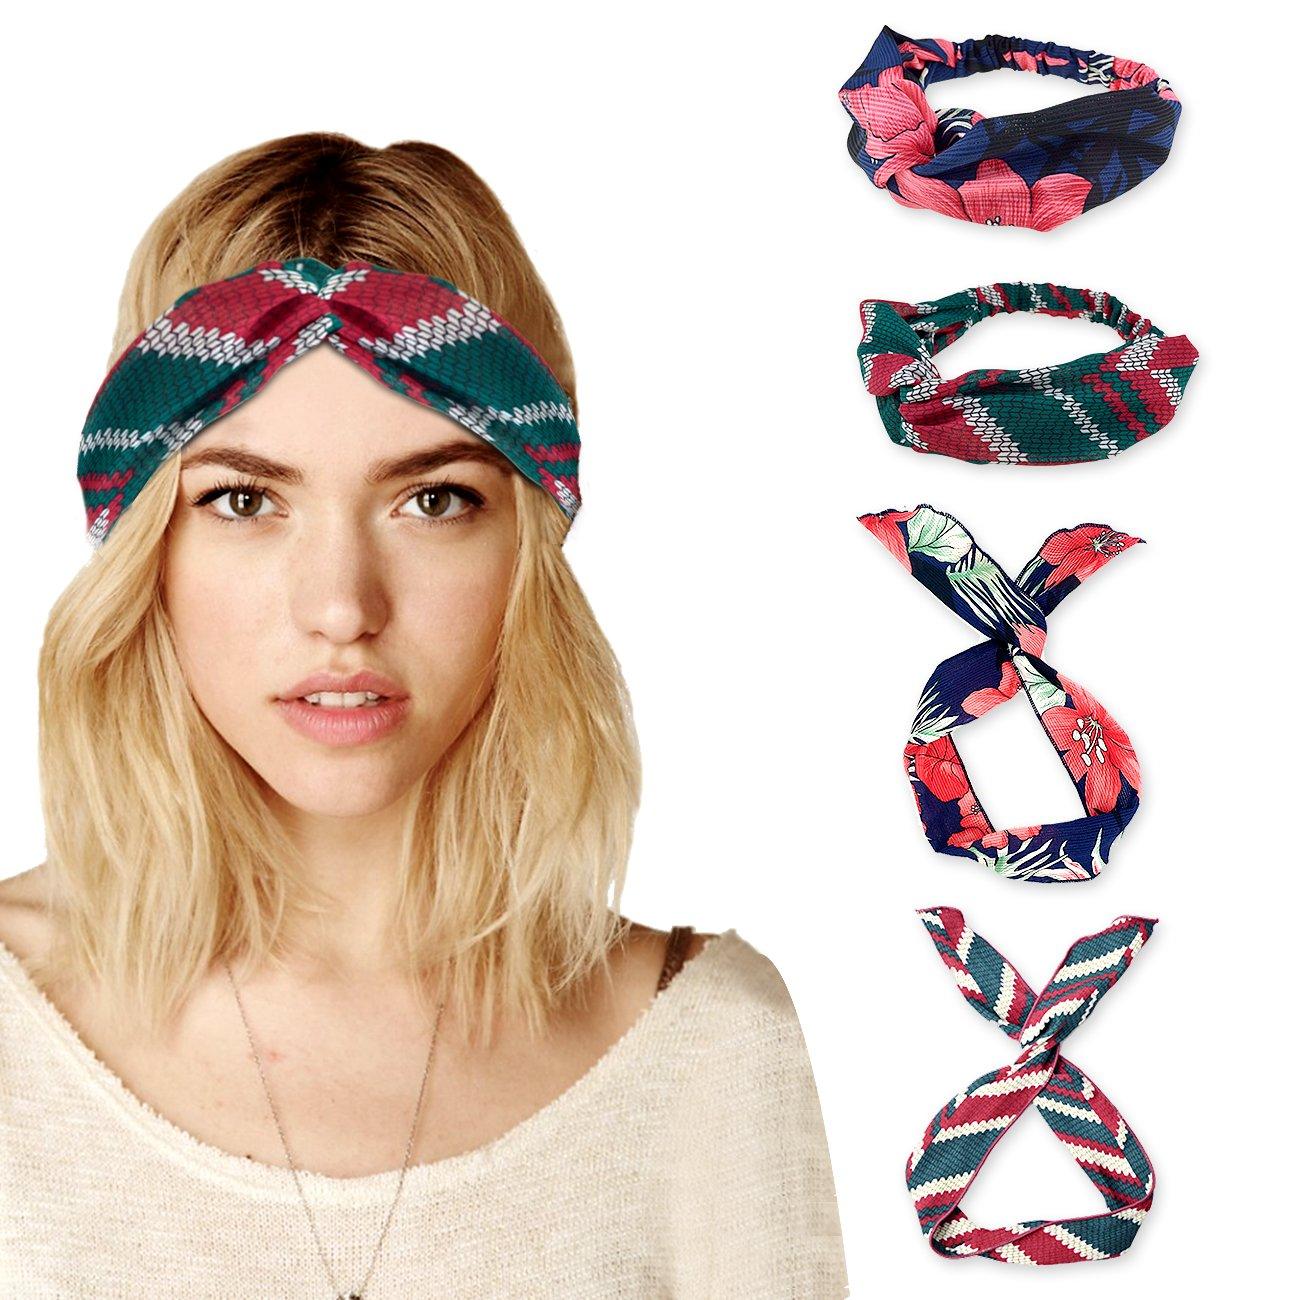 DRESHOW Bow Knotted Flower Headband Boho Floral Hair Band Facial Head Wrap Terry Cloth Yoga Sport Shower Headband Pack 6/8 HB0034-1